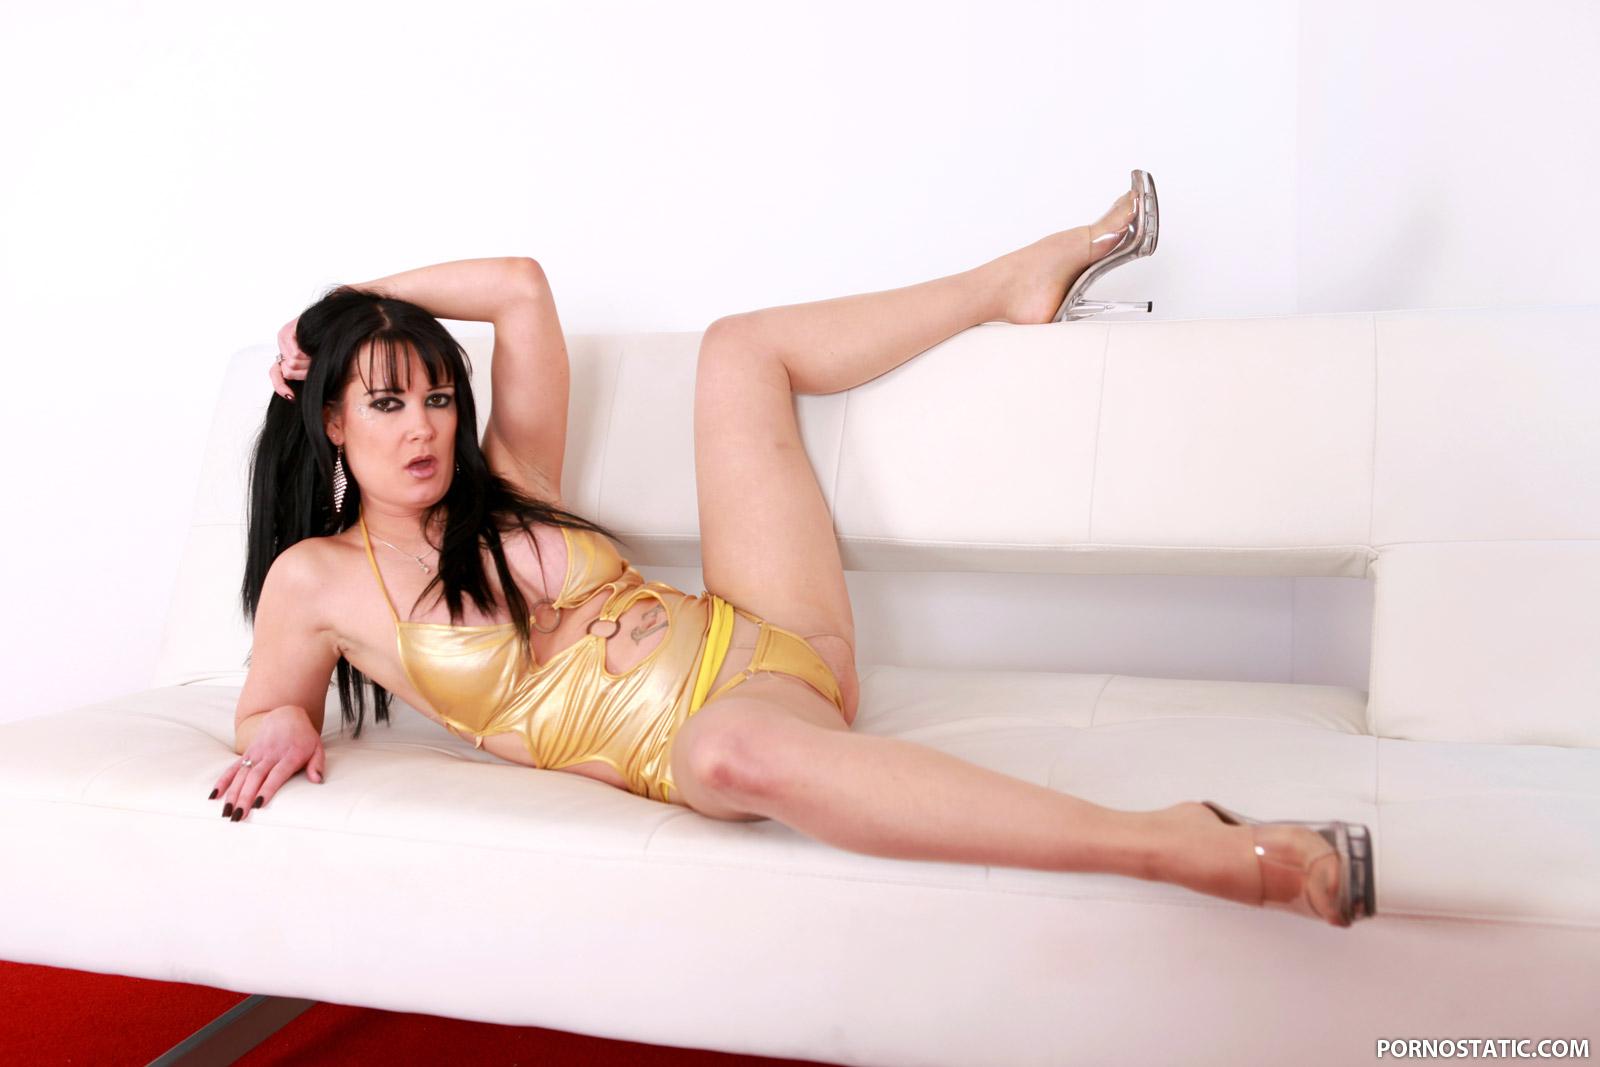 michael york nude pics